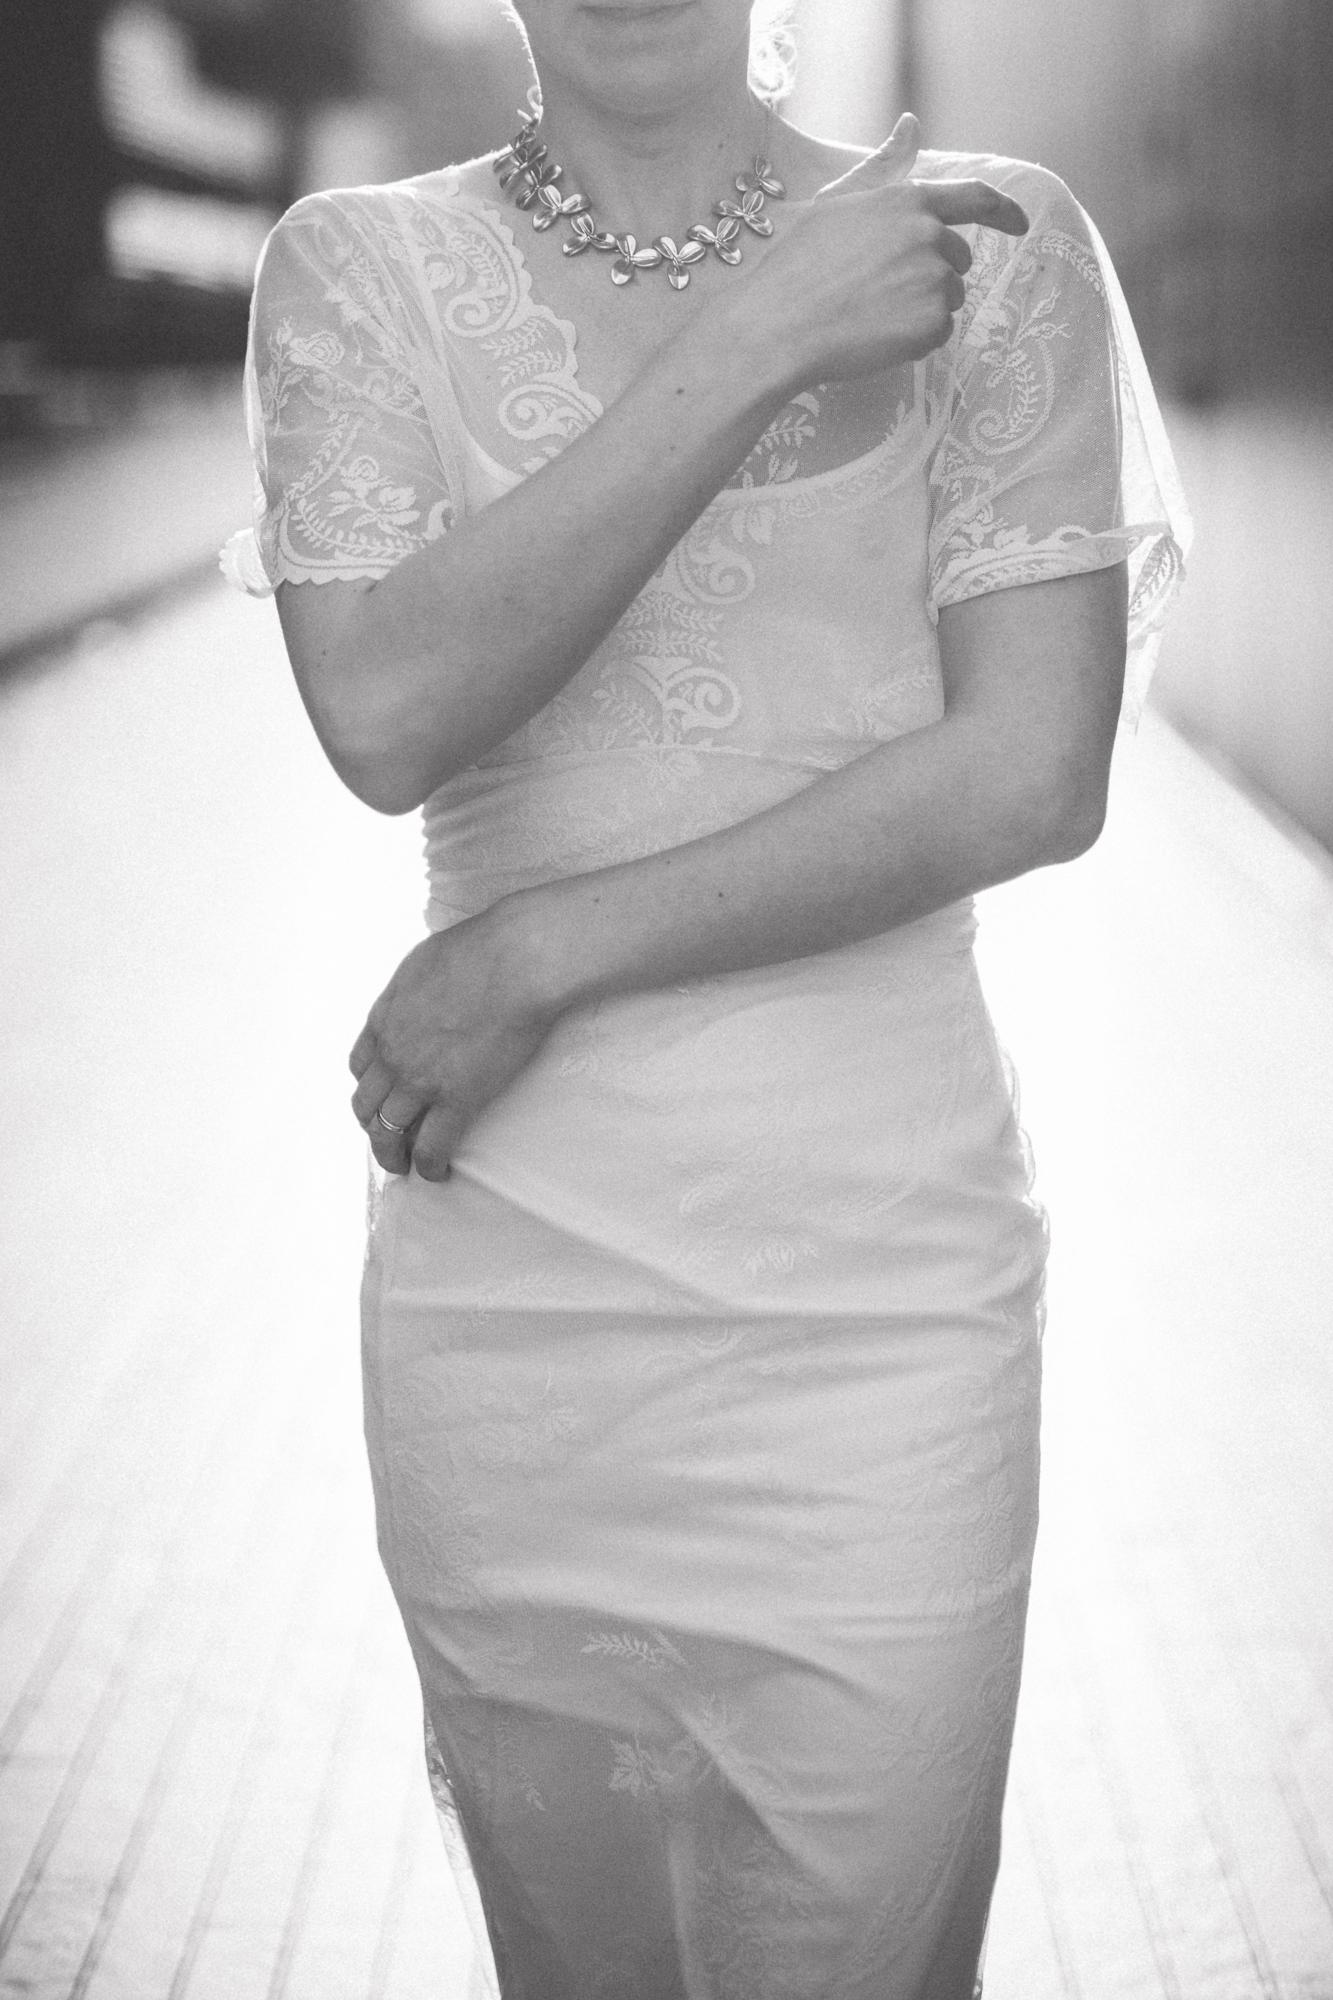 weddingphotographer_lindarehlin_preweddingphoto_london_SensibleM-55.jpg